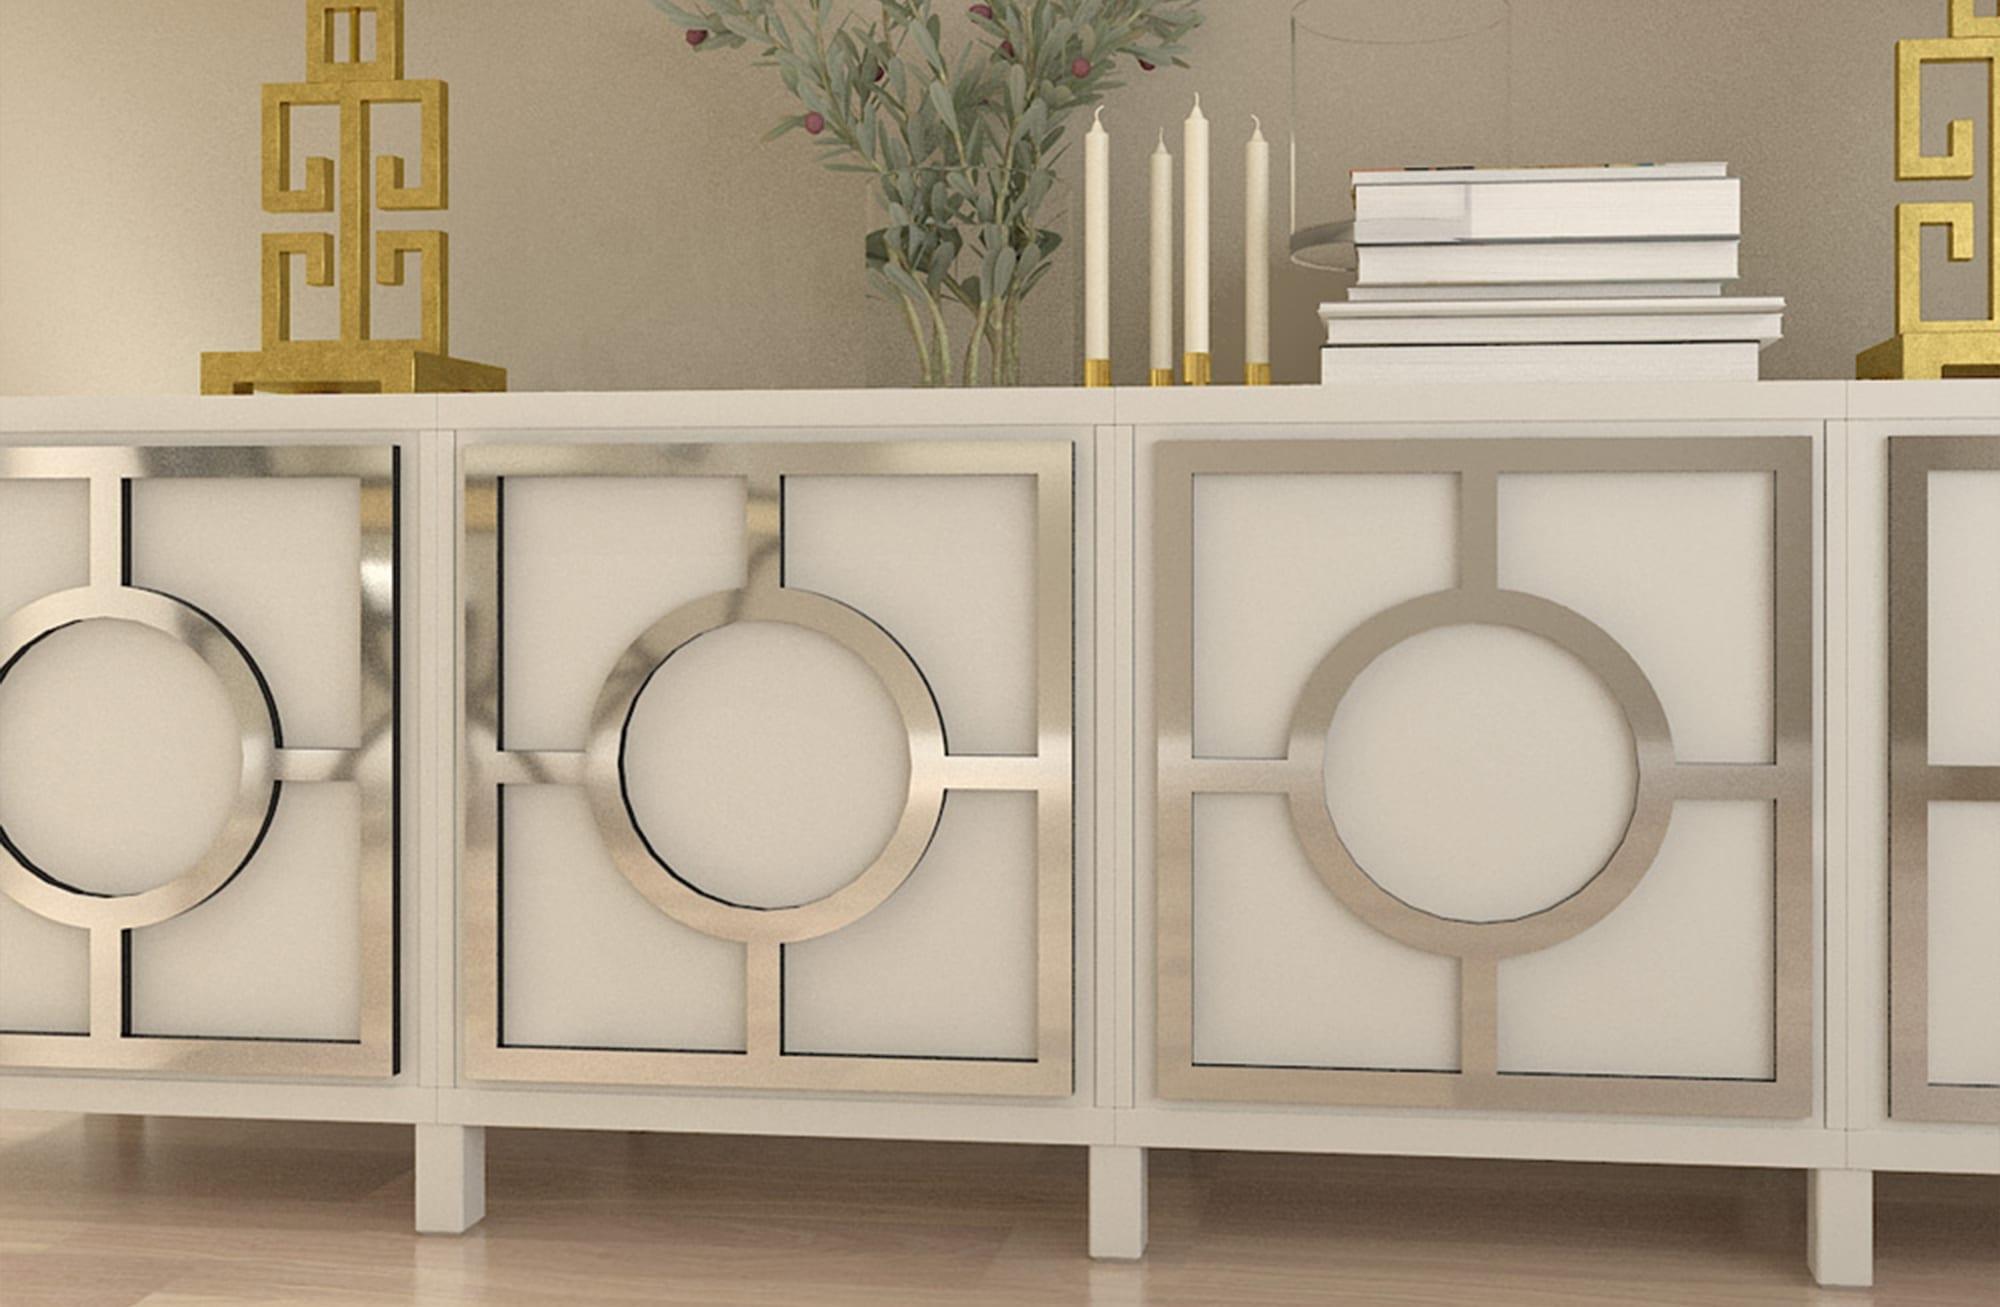 padr o porto para besta kits. Black Bedroom Furniture Sets. Home Design Ideas